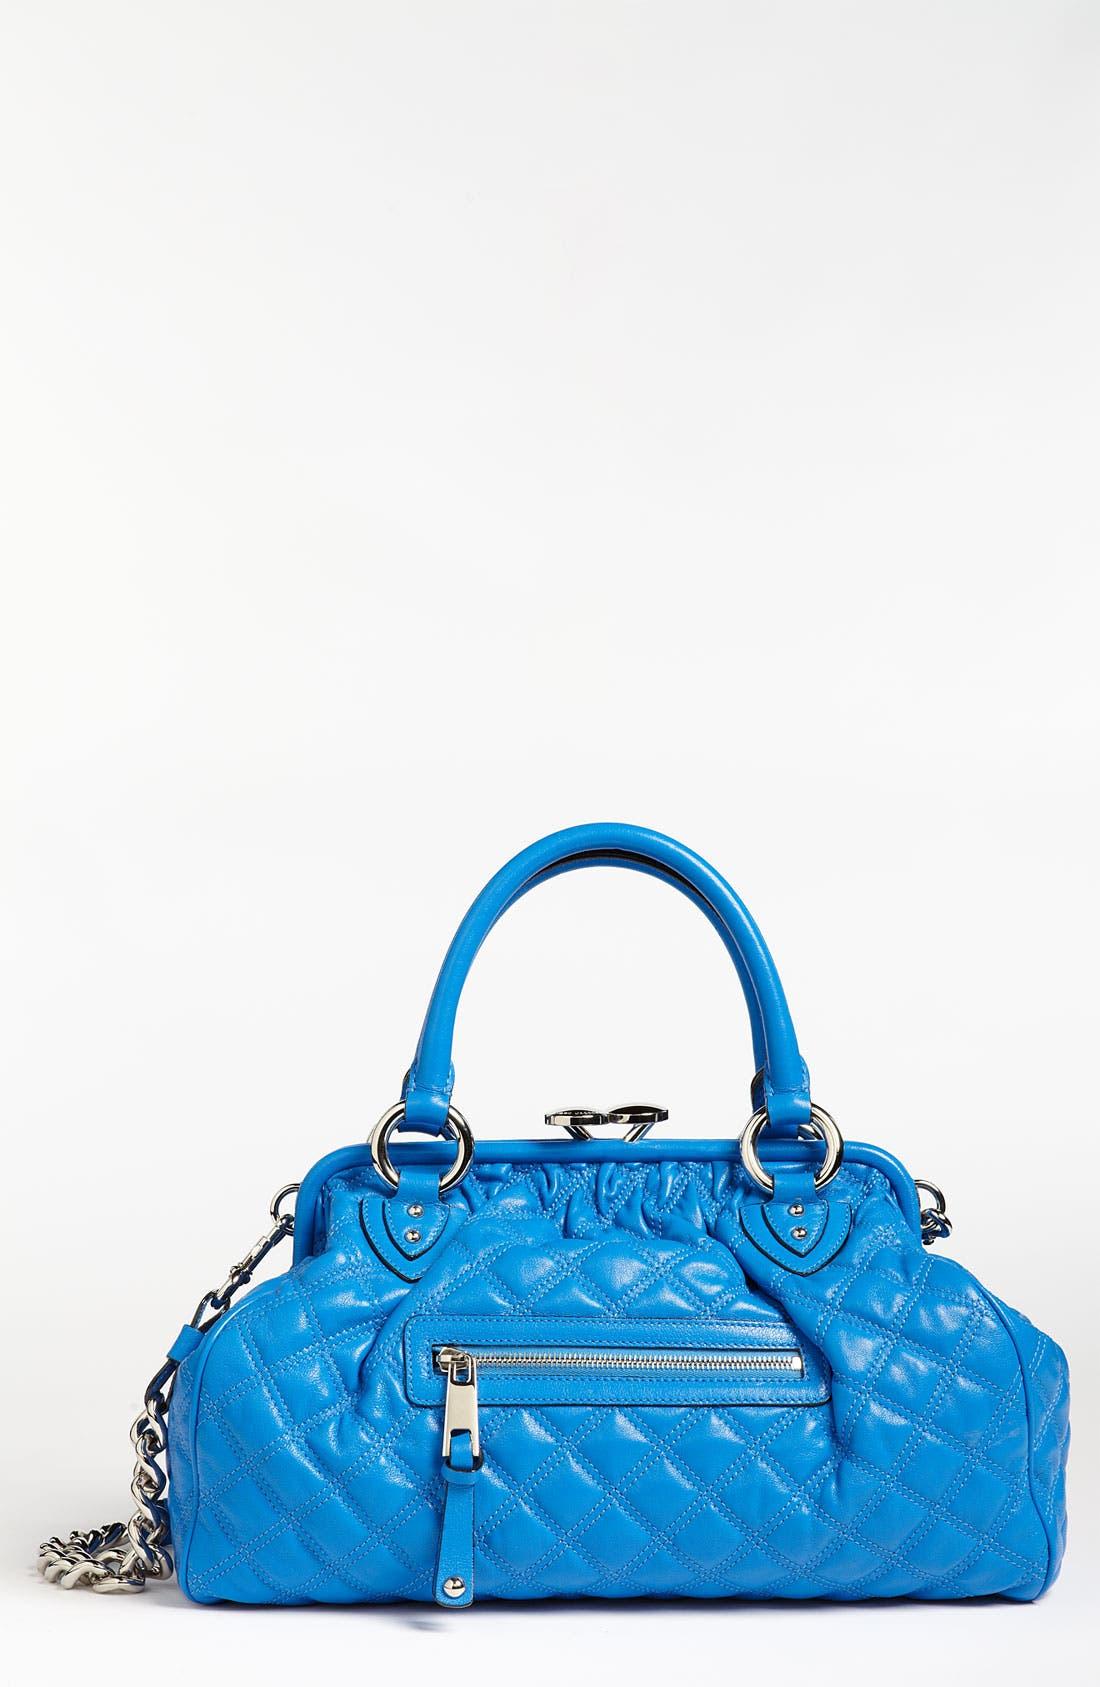 'Quilting Stam' Leather Satchel,                         Main,                         color, Bluette/ Nickel